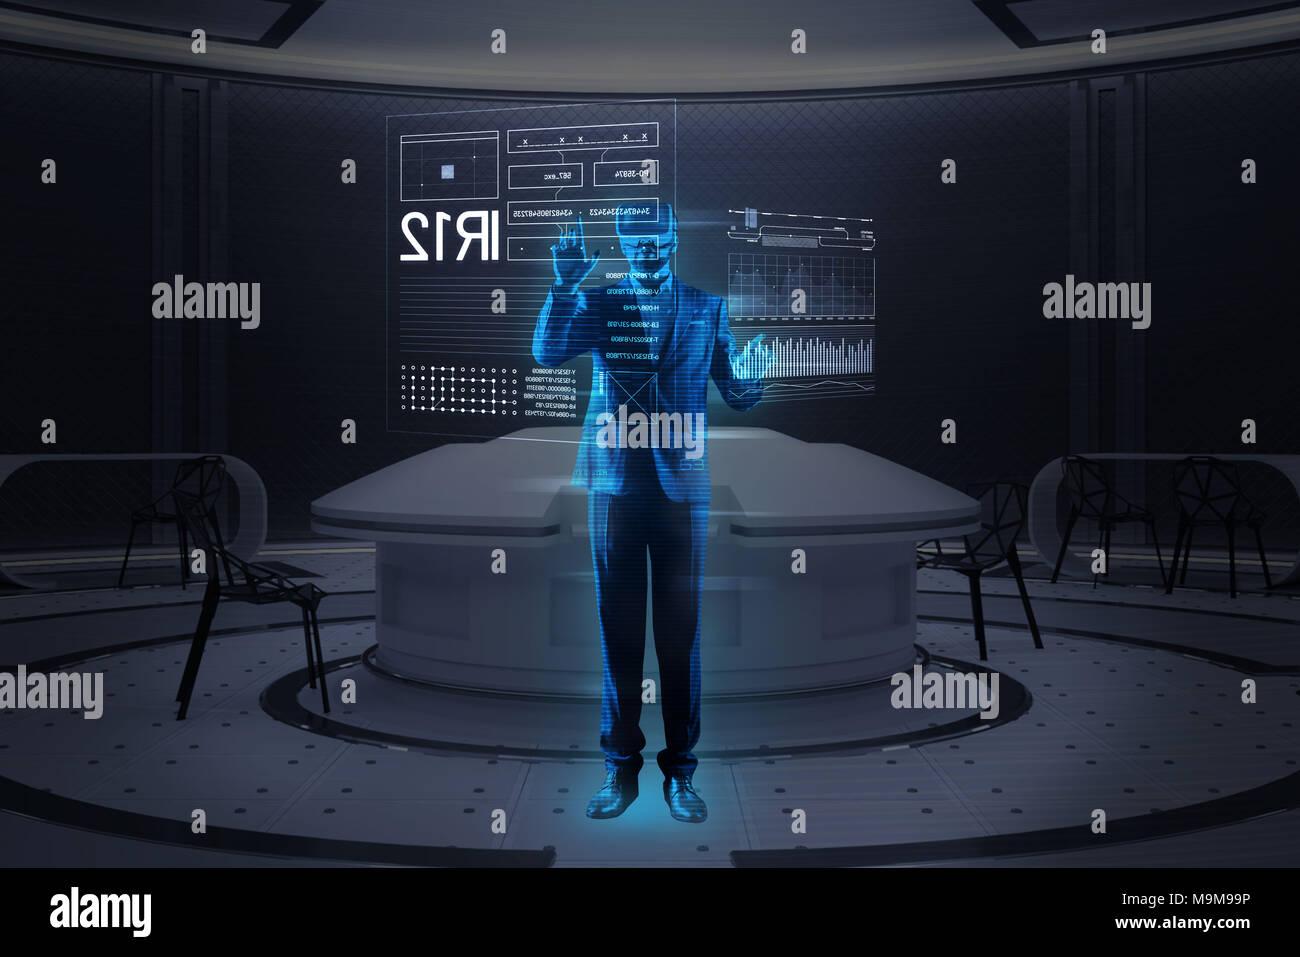 Progressive programmer making a hologram image while working - Stock Image